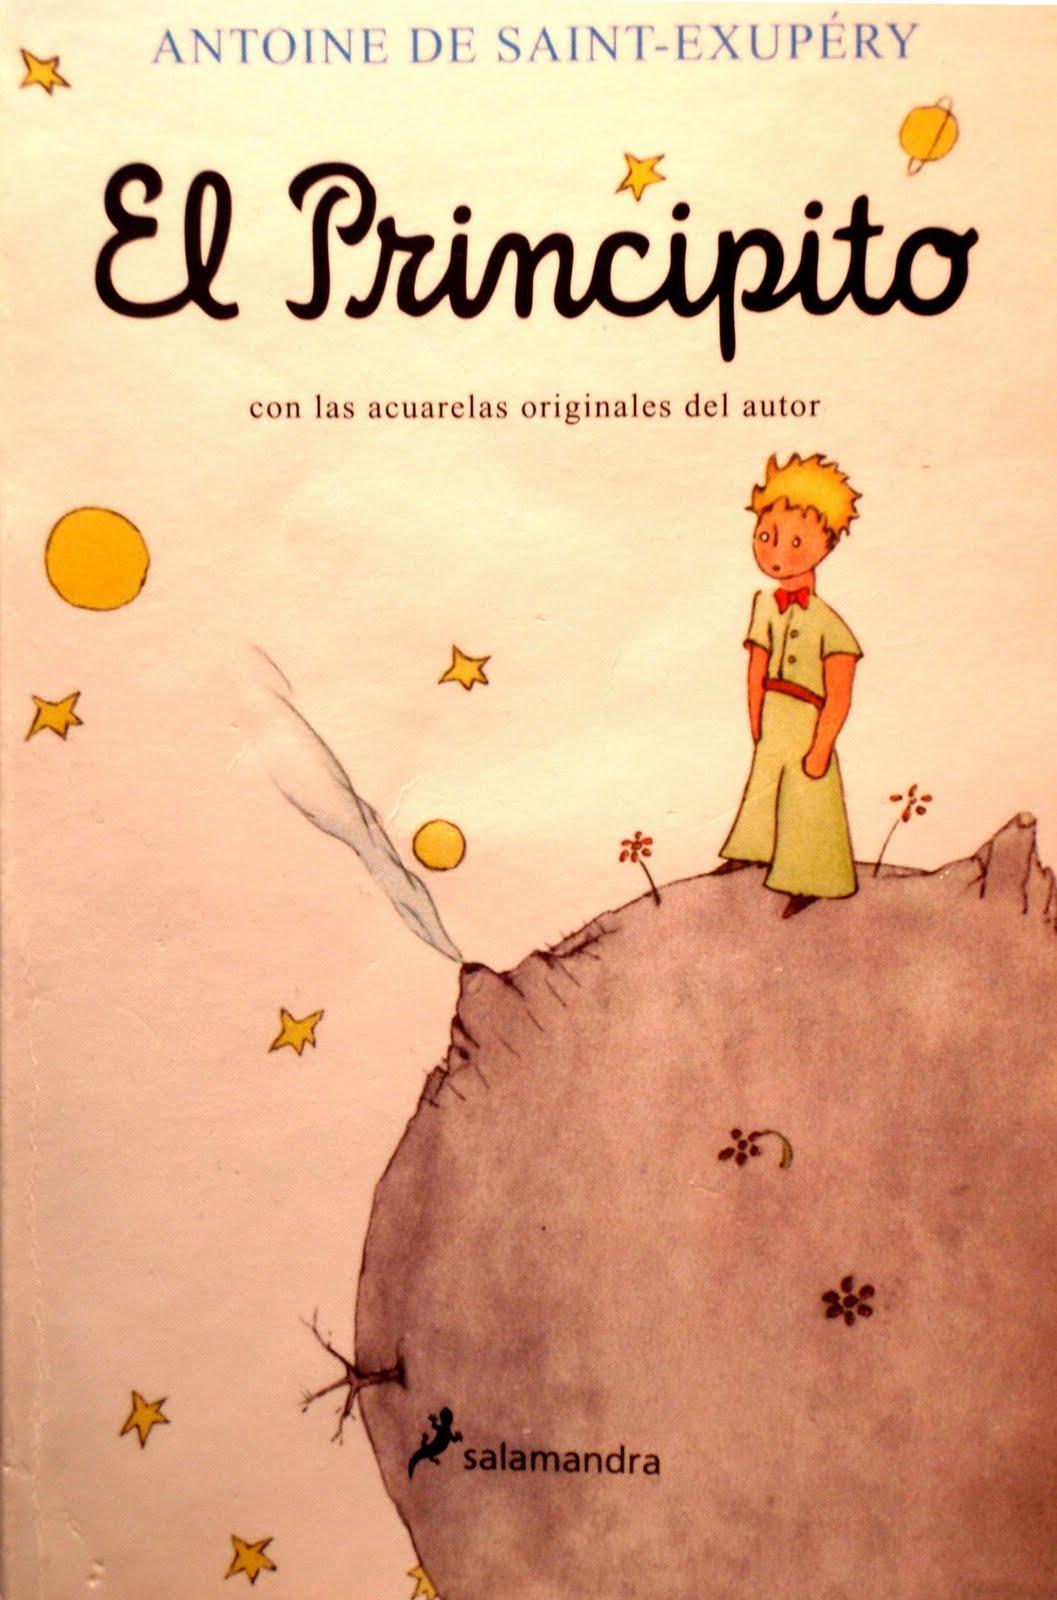 Mini Libro El Principito Completo Actiludis | apexwallpapers.com